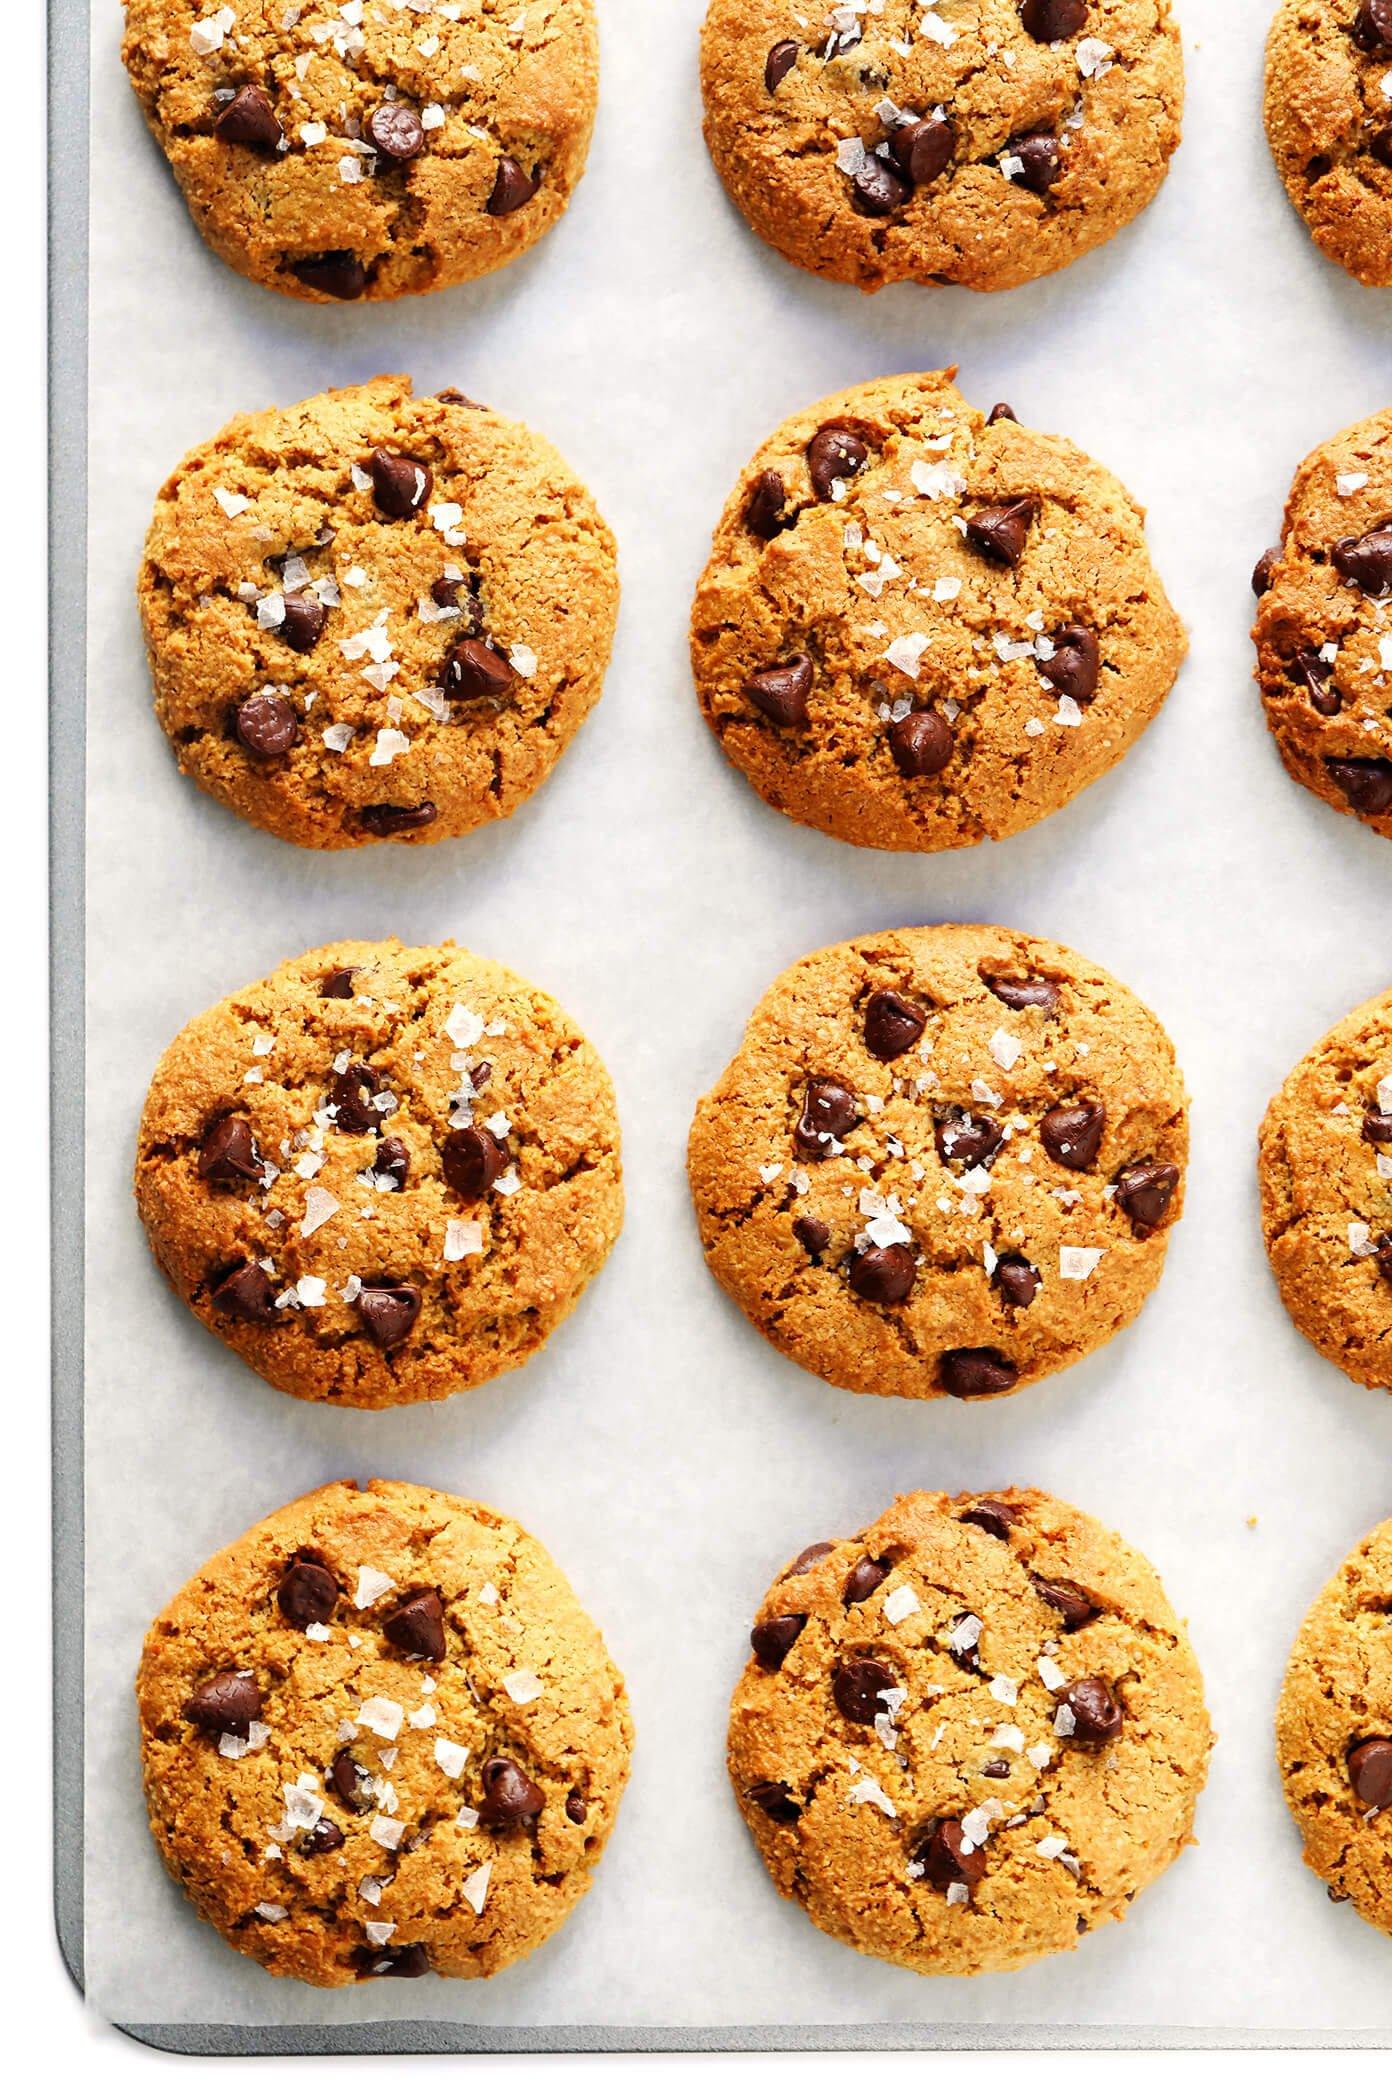 Gluten-Free Vegan Chocolate Chip Cookies Recipe